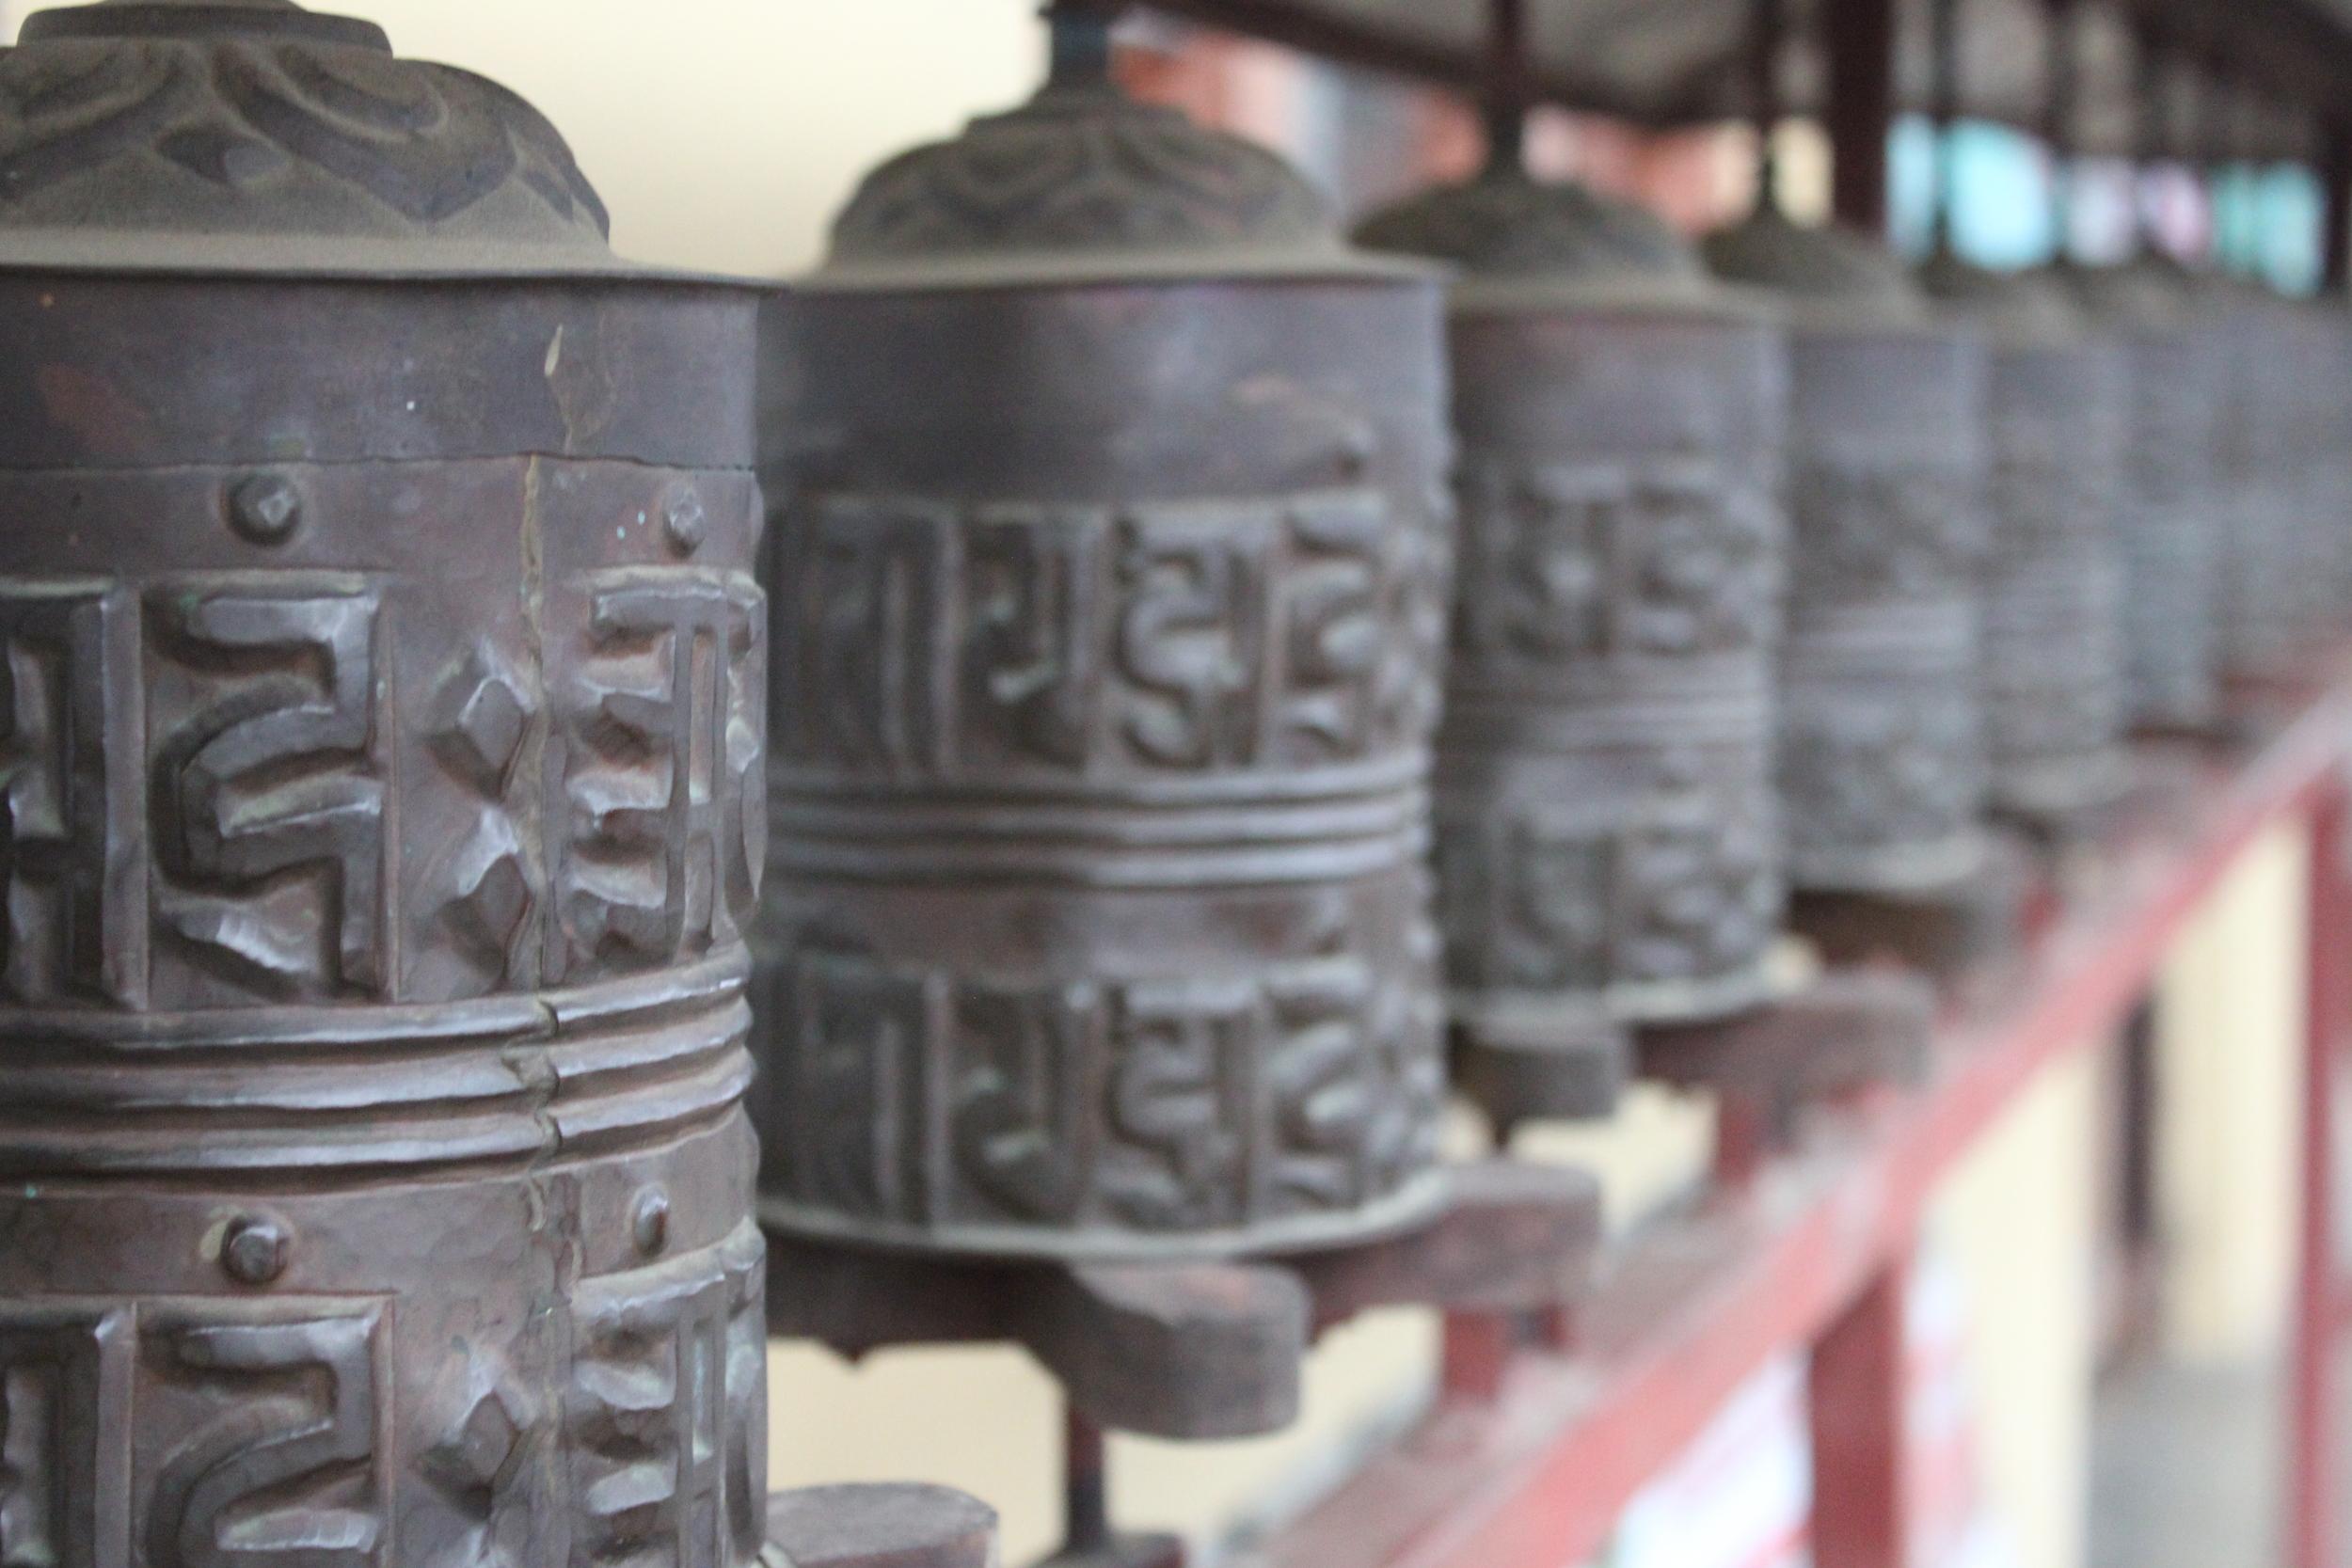 Buddhist prayer wheels in rural community in the Annapurna region of Nepal